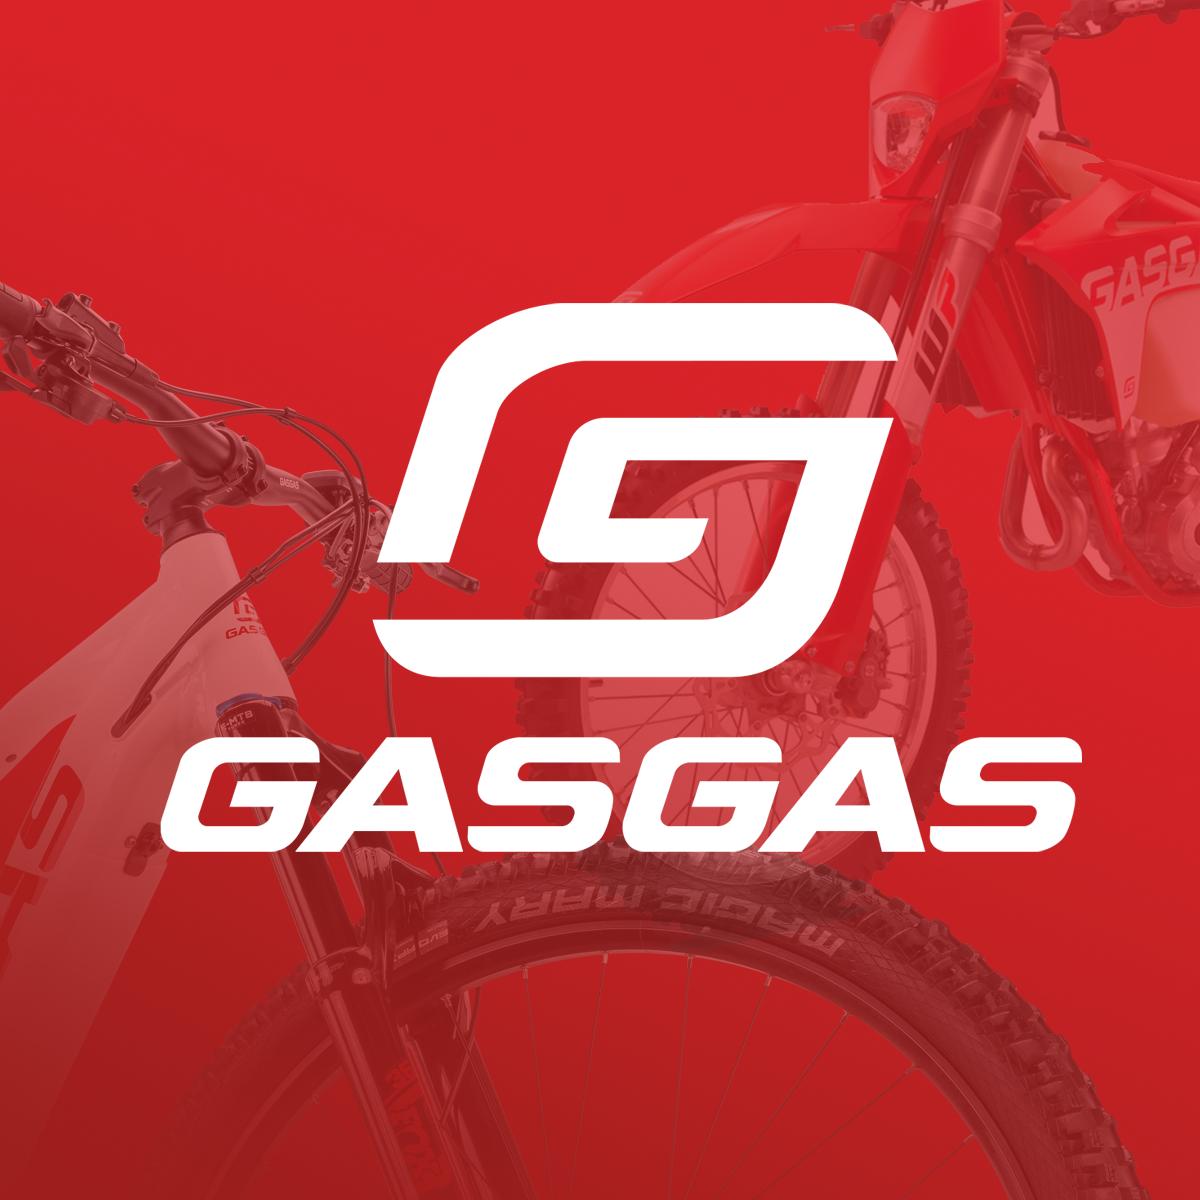 https://www.gasgas-kosak.de